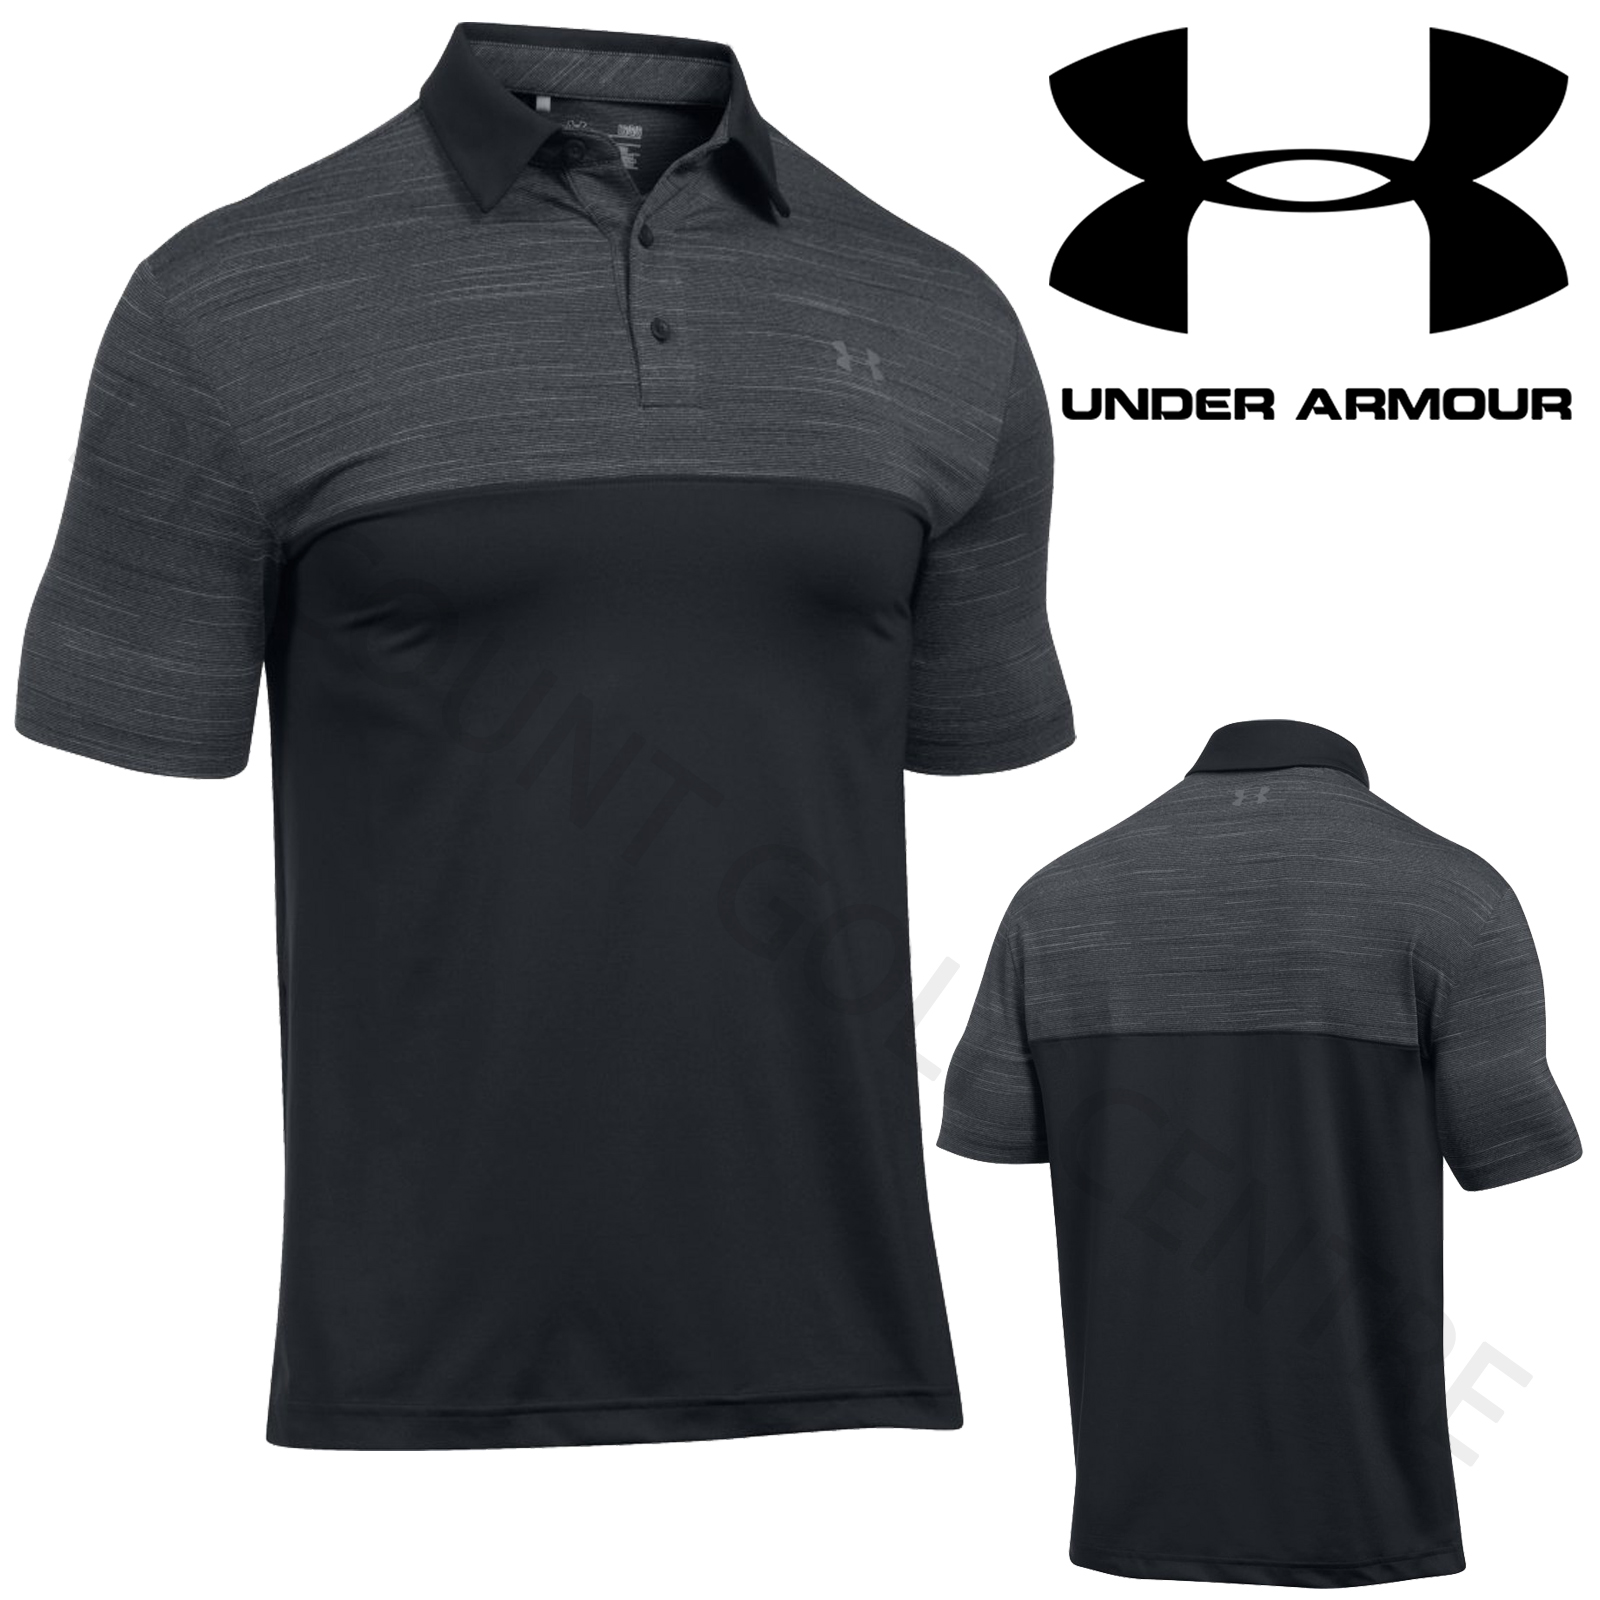 Under armour 2017 ua mens playoff blocked golf heatgear for Under armour tottenham polo shirt